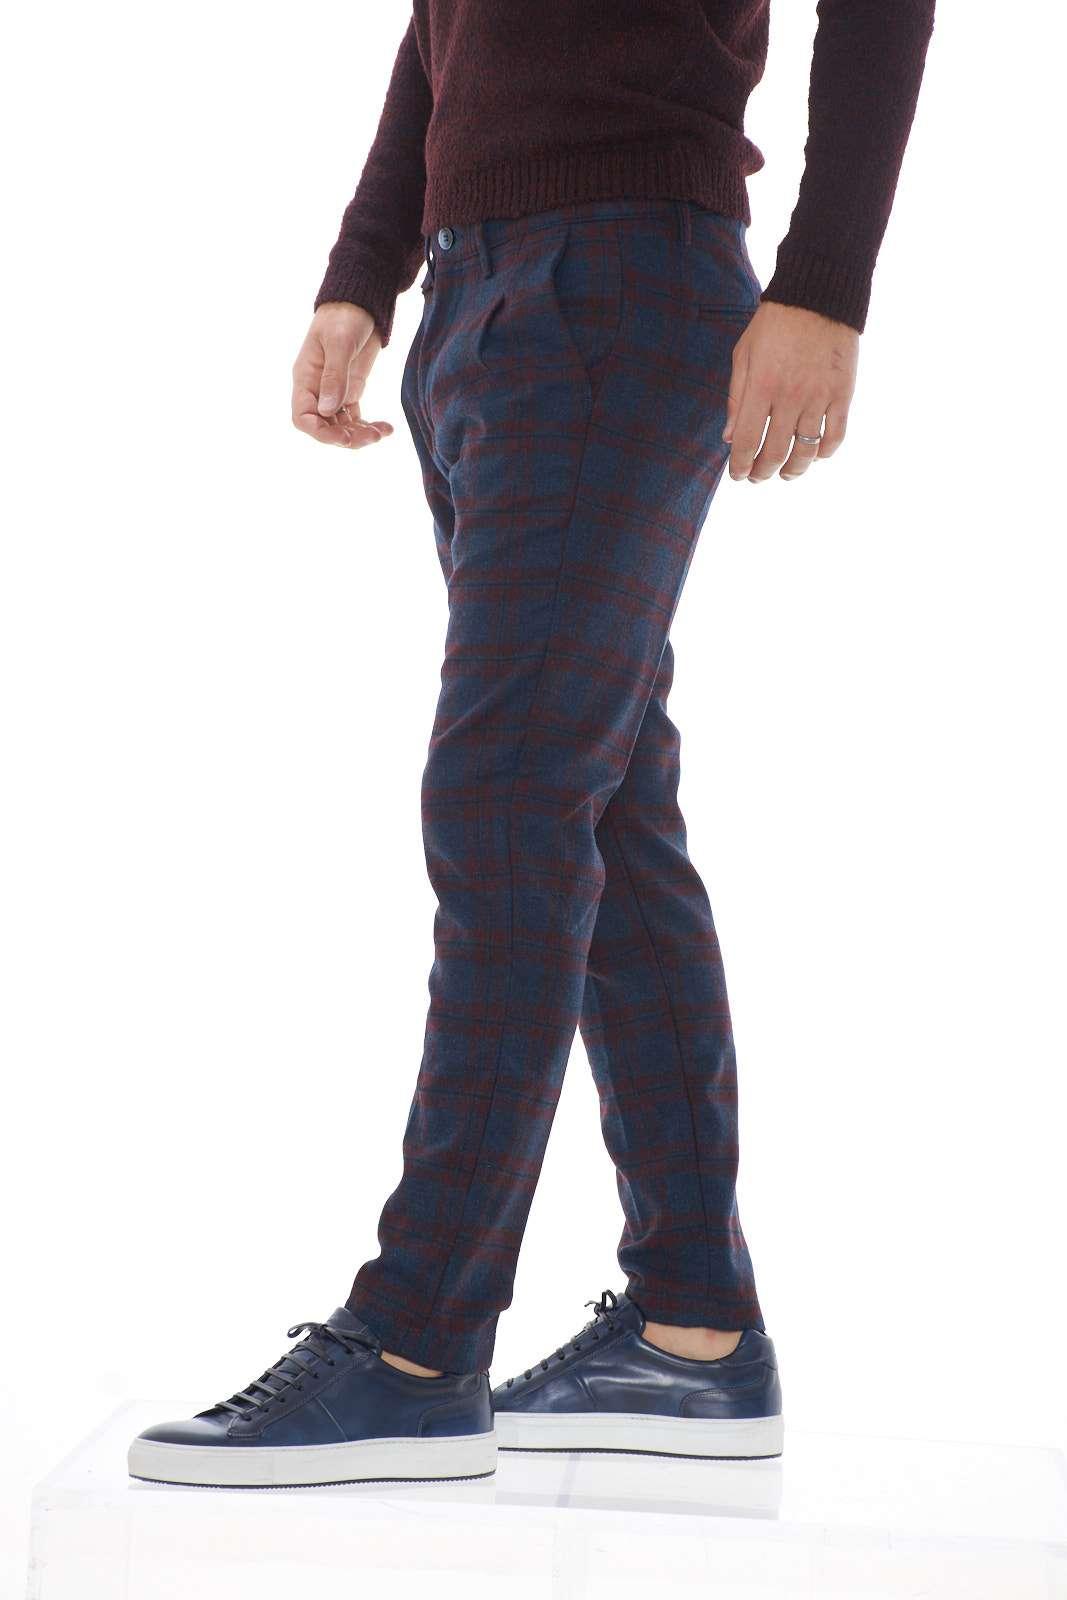 https://www.parmax.com/media/catalog/product/A/I/AI-outlet_parmax-pantaloni-uomo-Squad-ffc9804-B_2.jpg